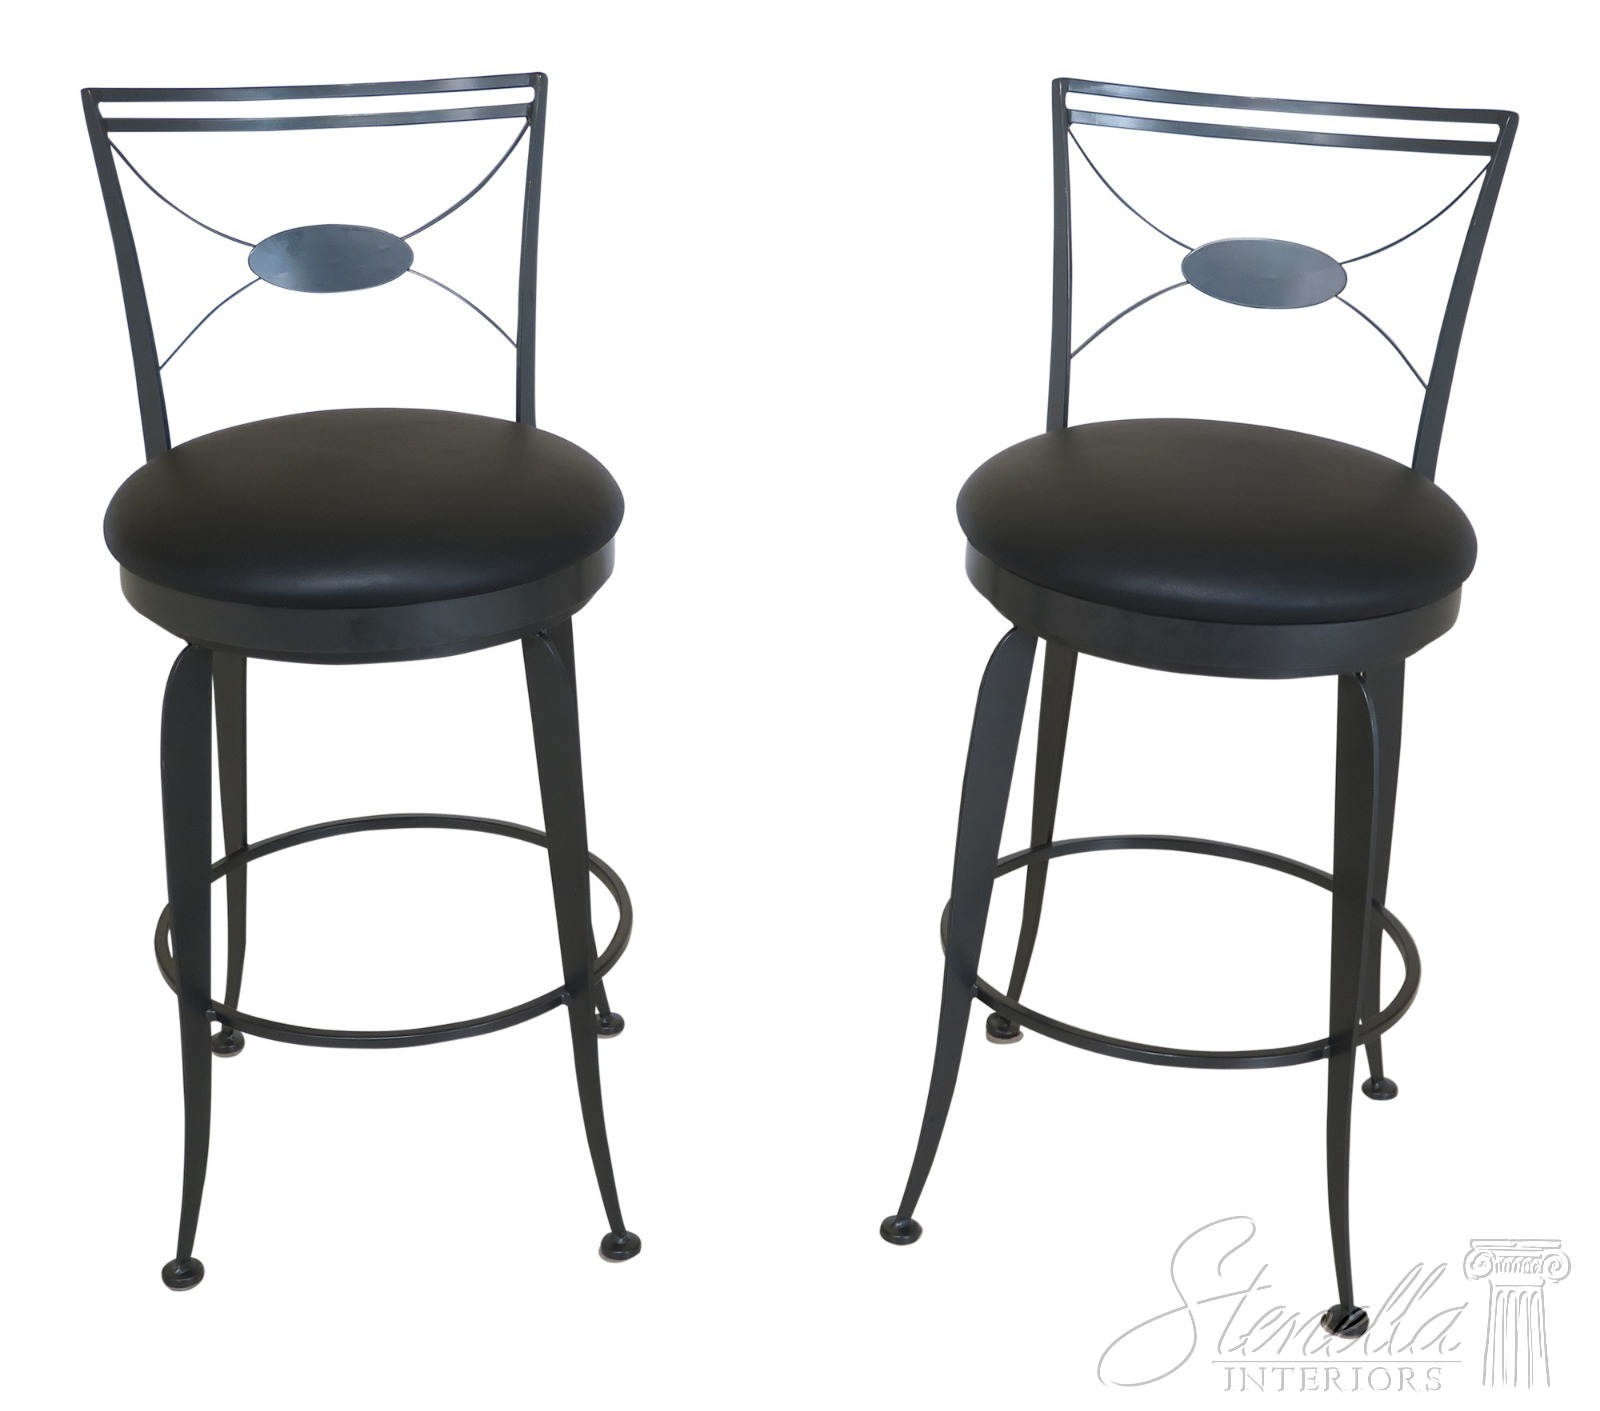 Pair of Mid Century Hair Pin Swivel Bar Counter Stools Chairs B